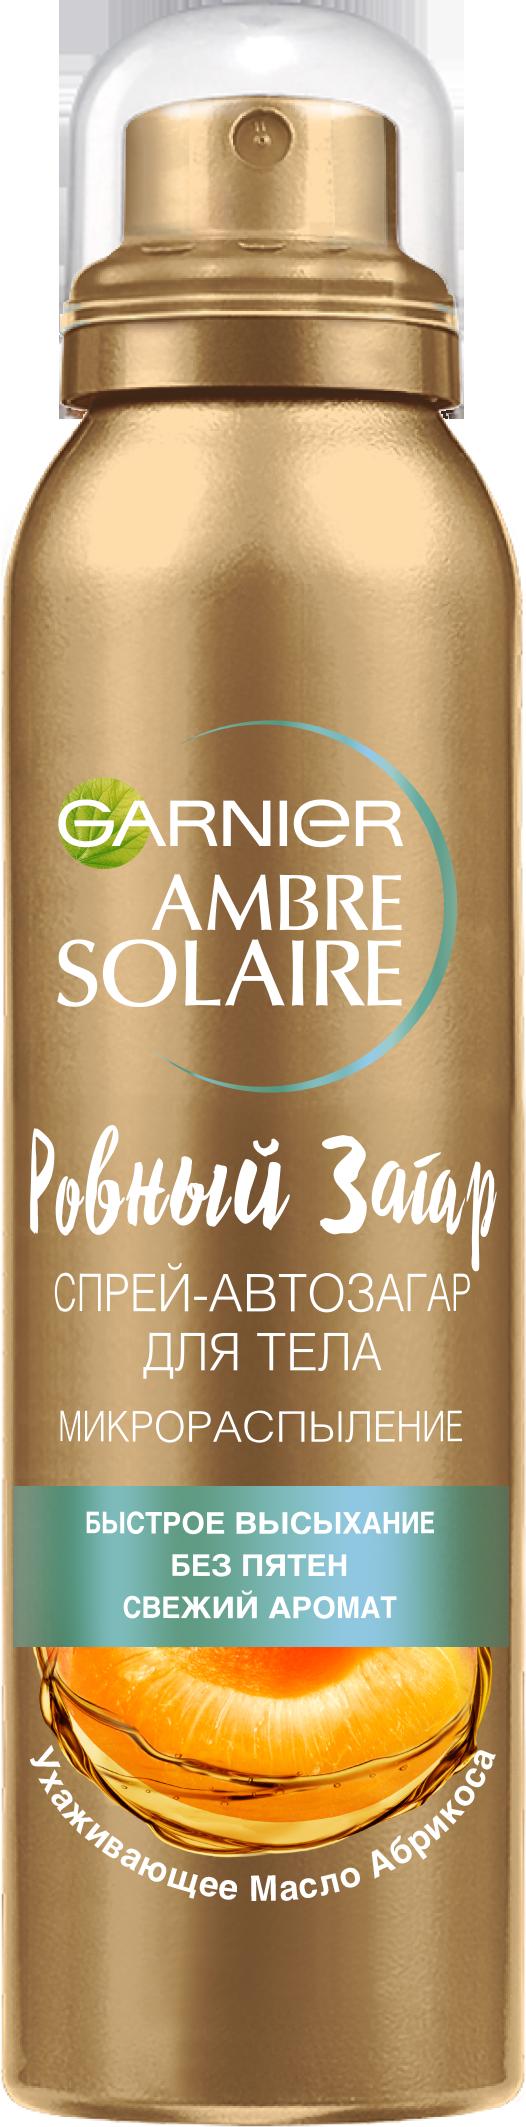 Спрей автозагар для тела Garnier Ambre Solaire